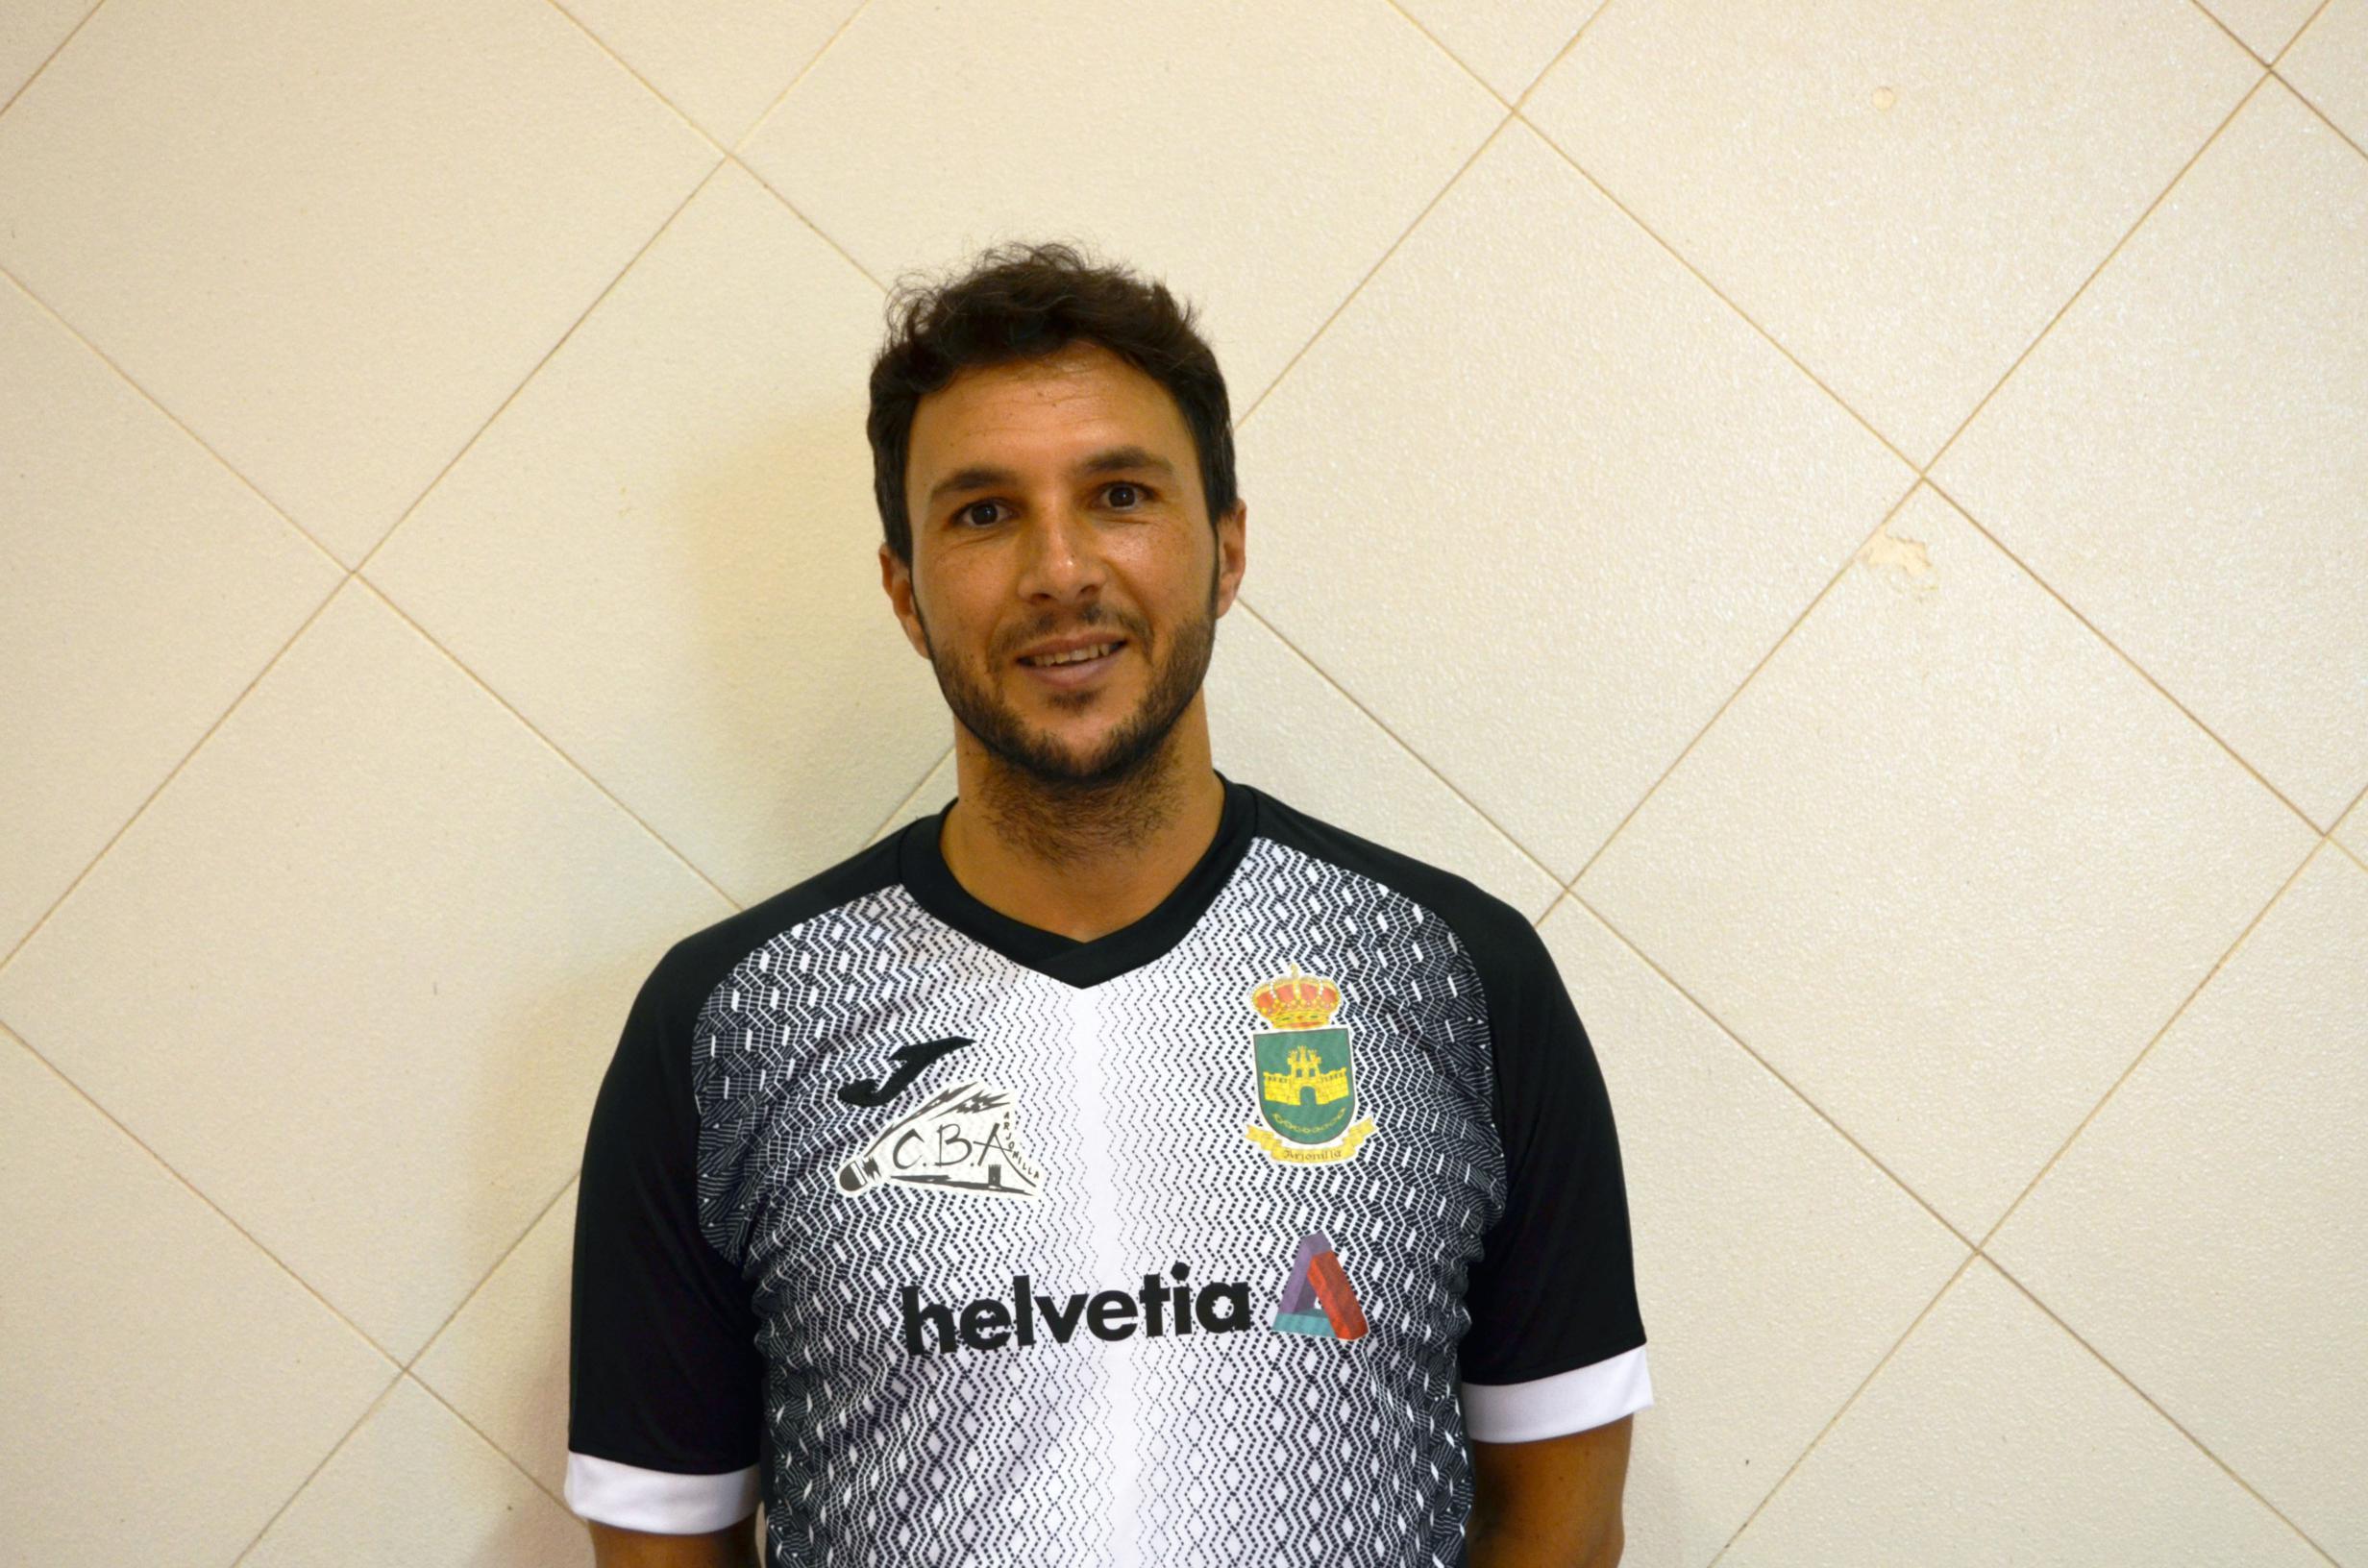 Lucas Carmona